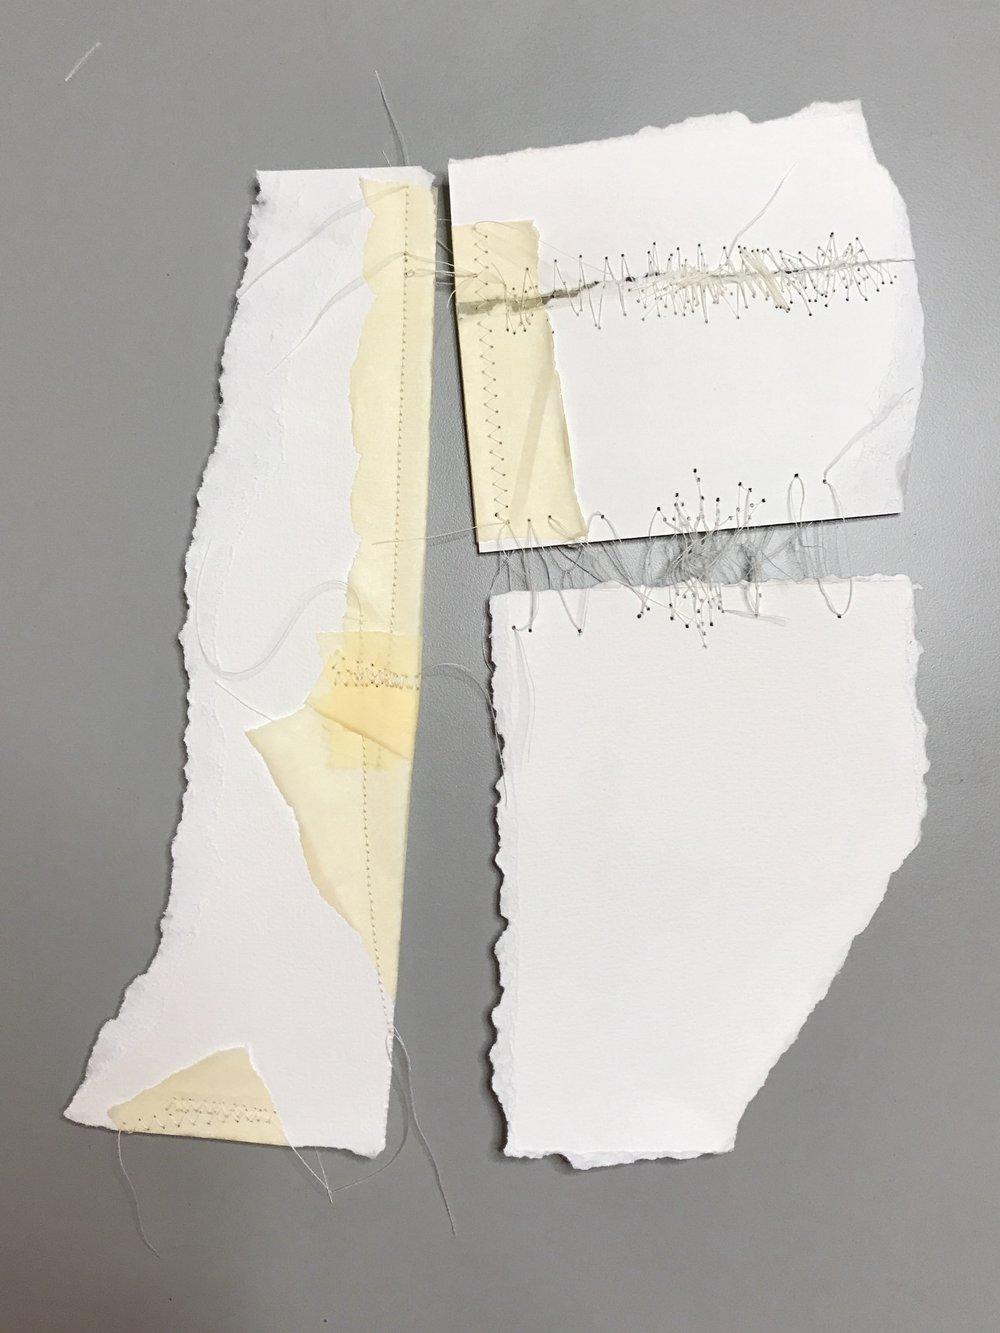 Kelly M. O'Brien,  Mending | Tending No. 6 . Paper, thread. 15 x 15 x 2.5 inches box framed. ©2017